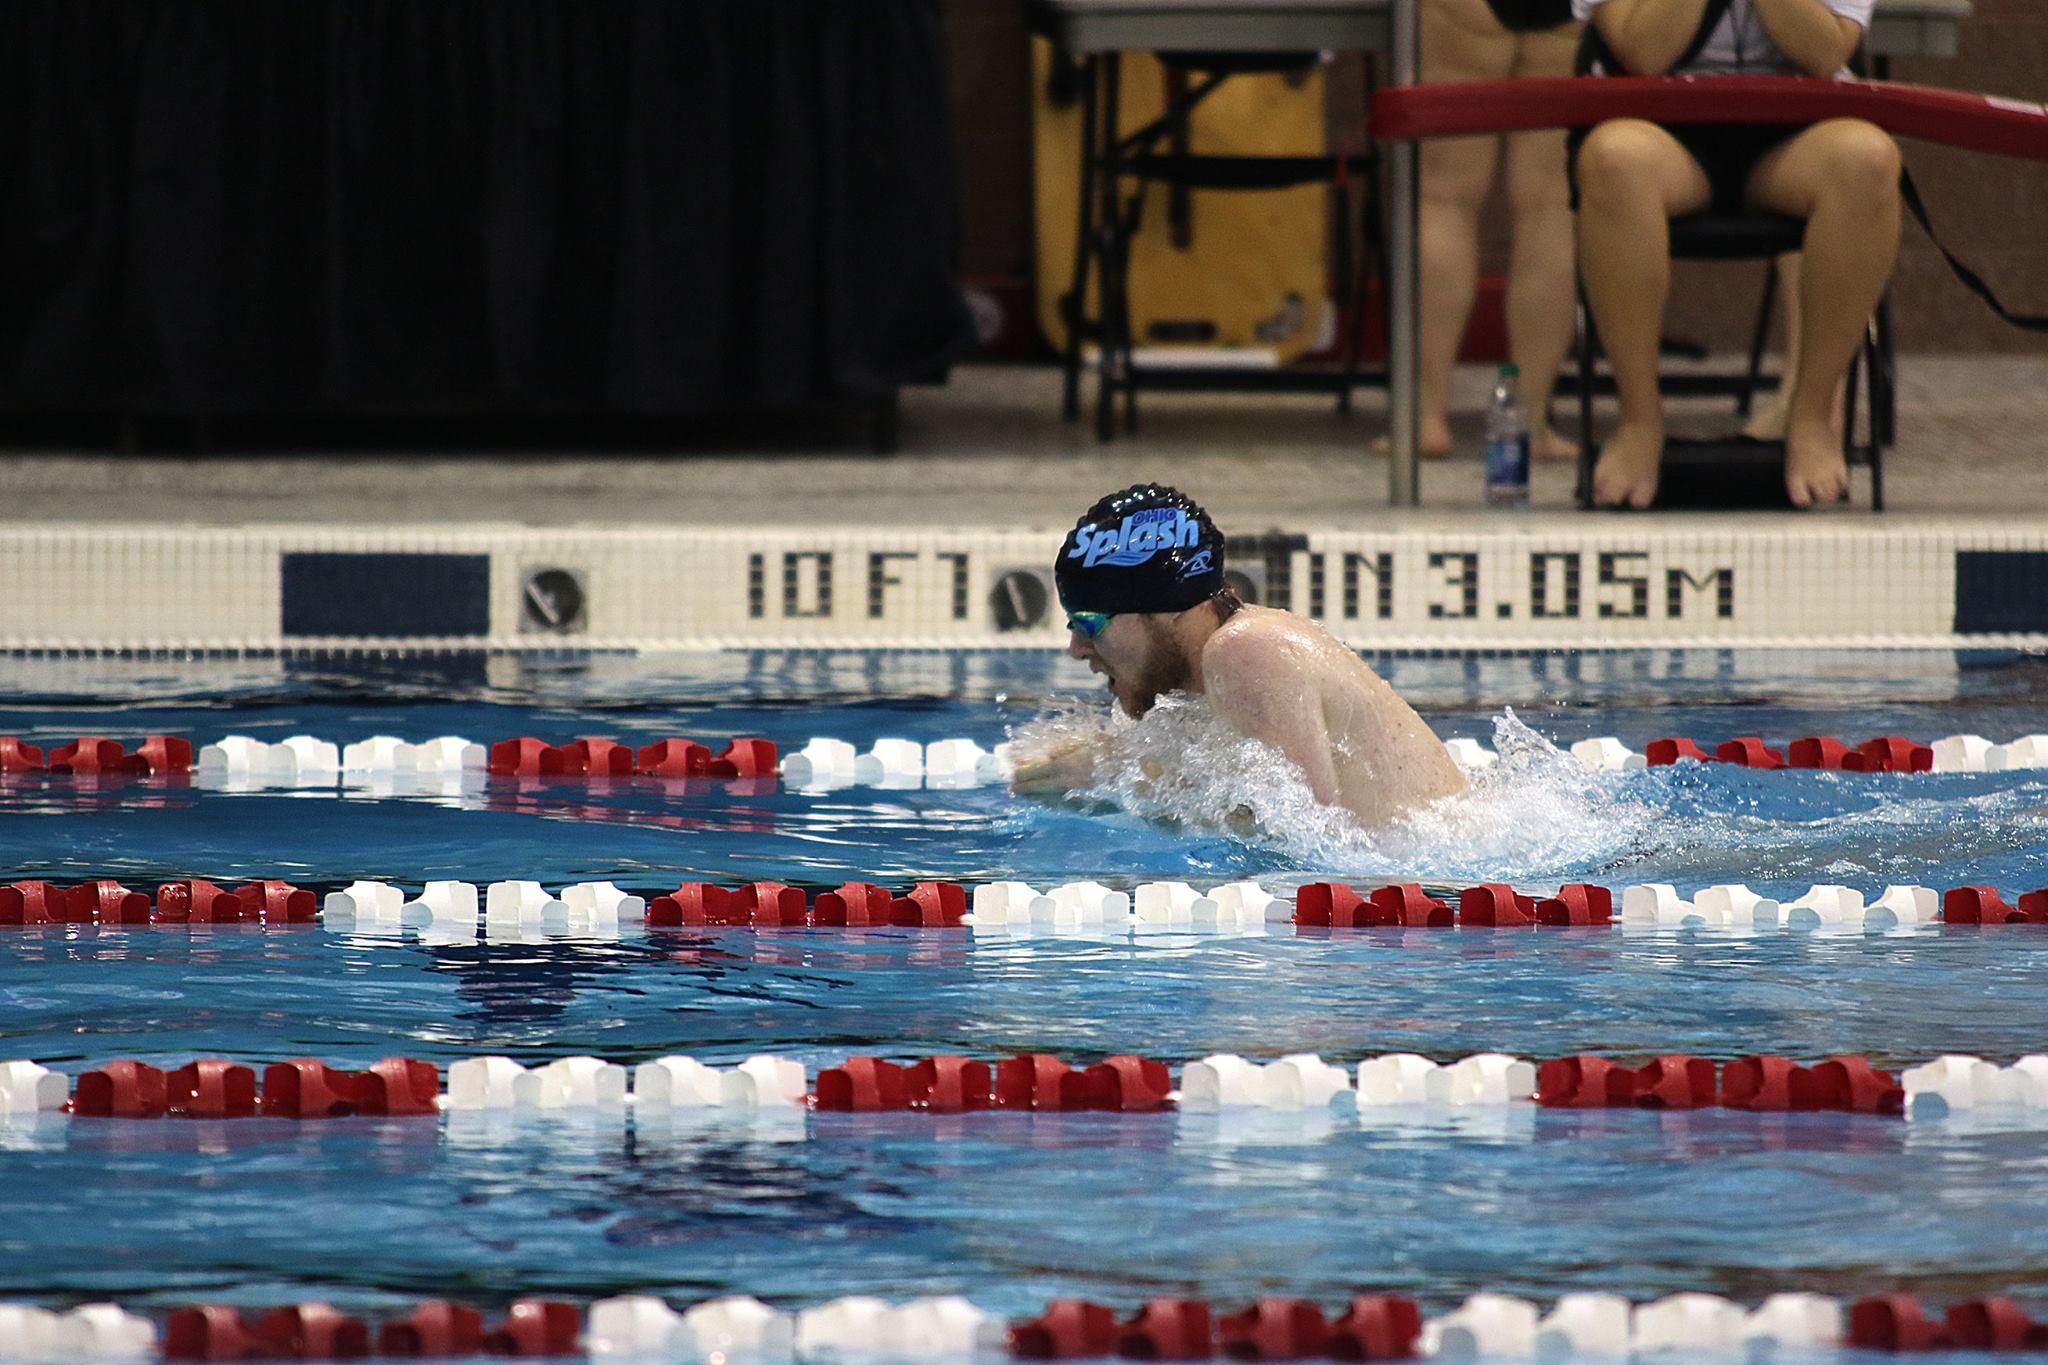 Splash-Championship-2016-0023